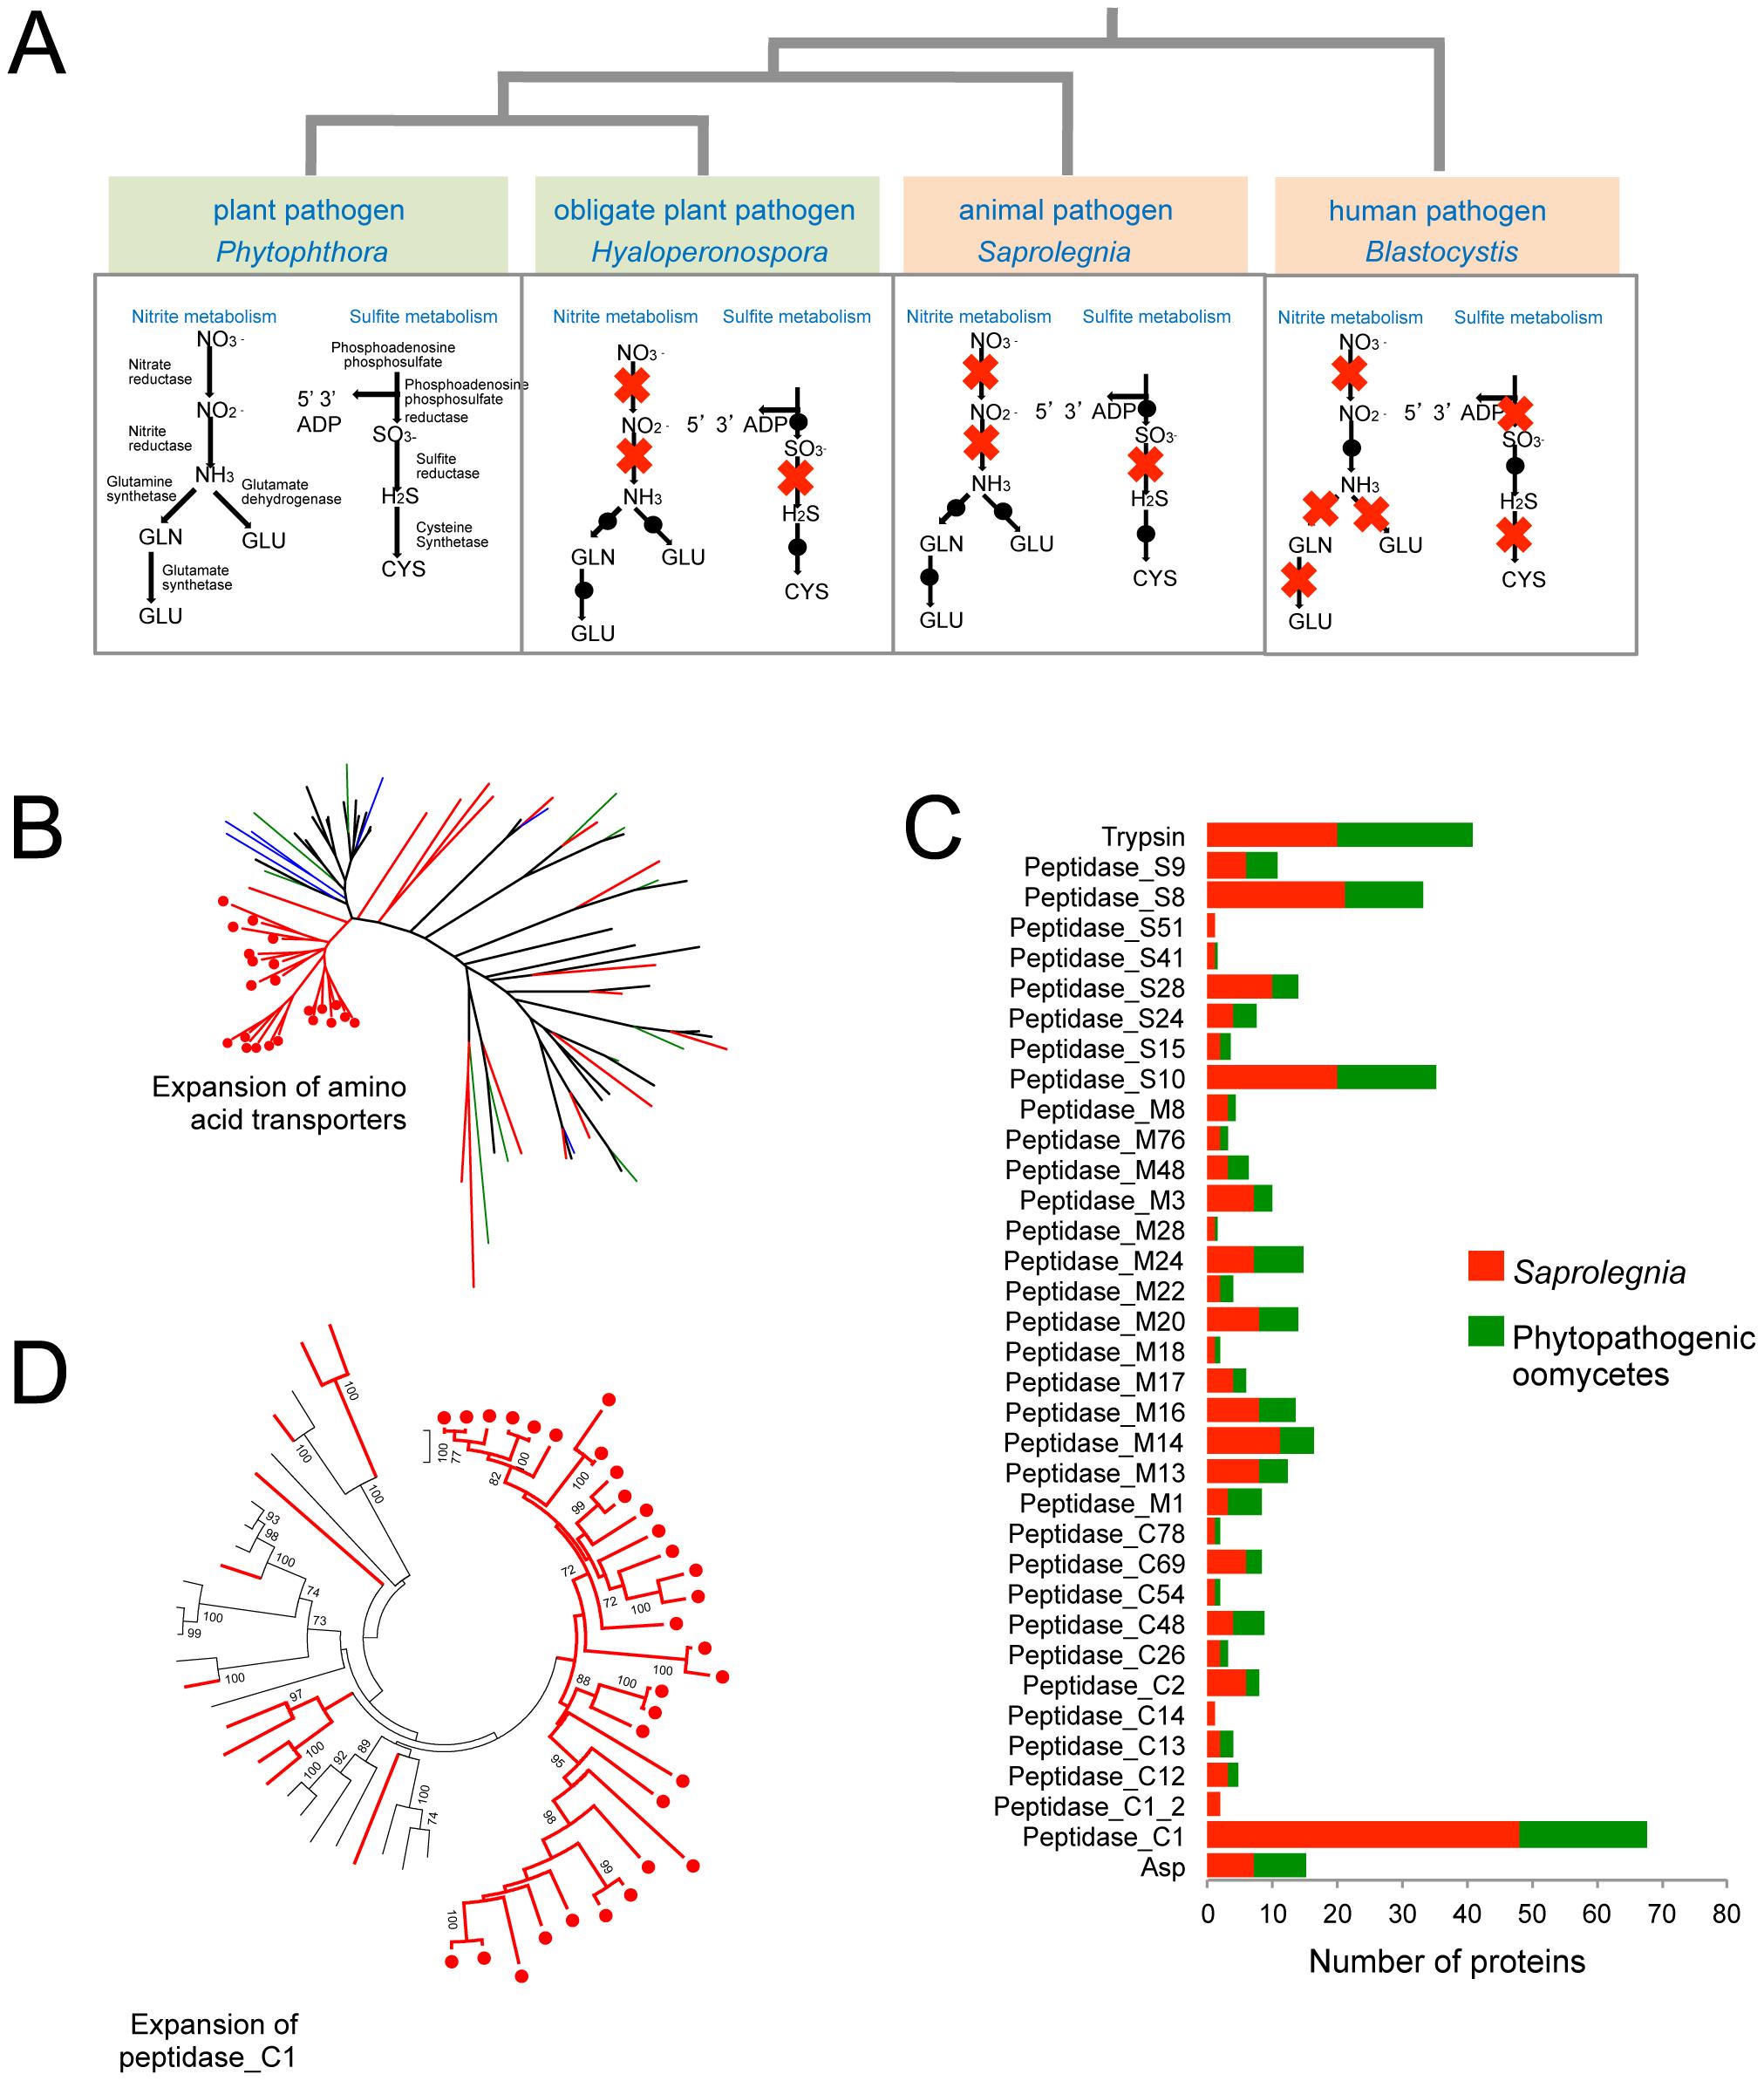 Metabolic adaptations to animal pathogenesis.